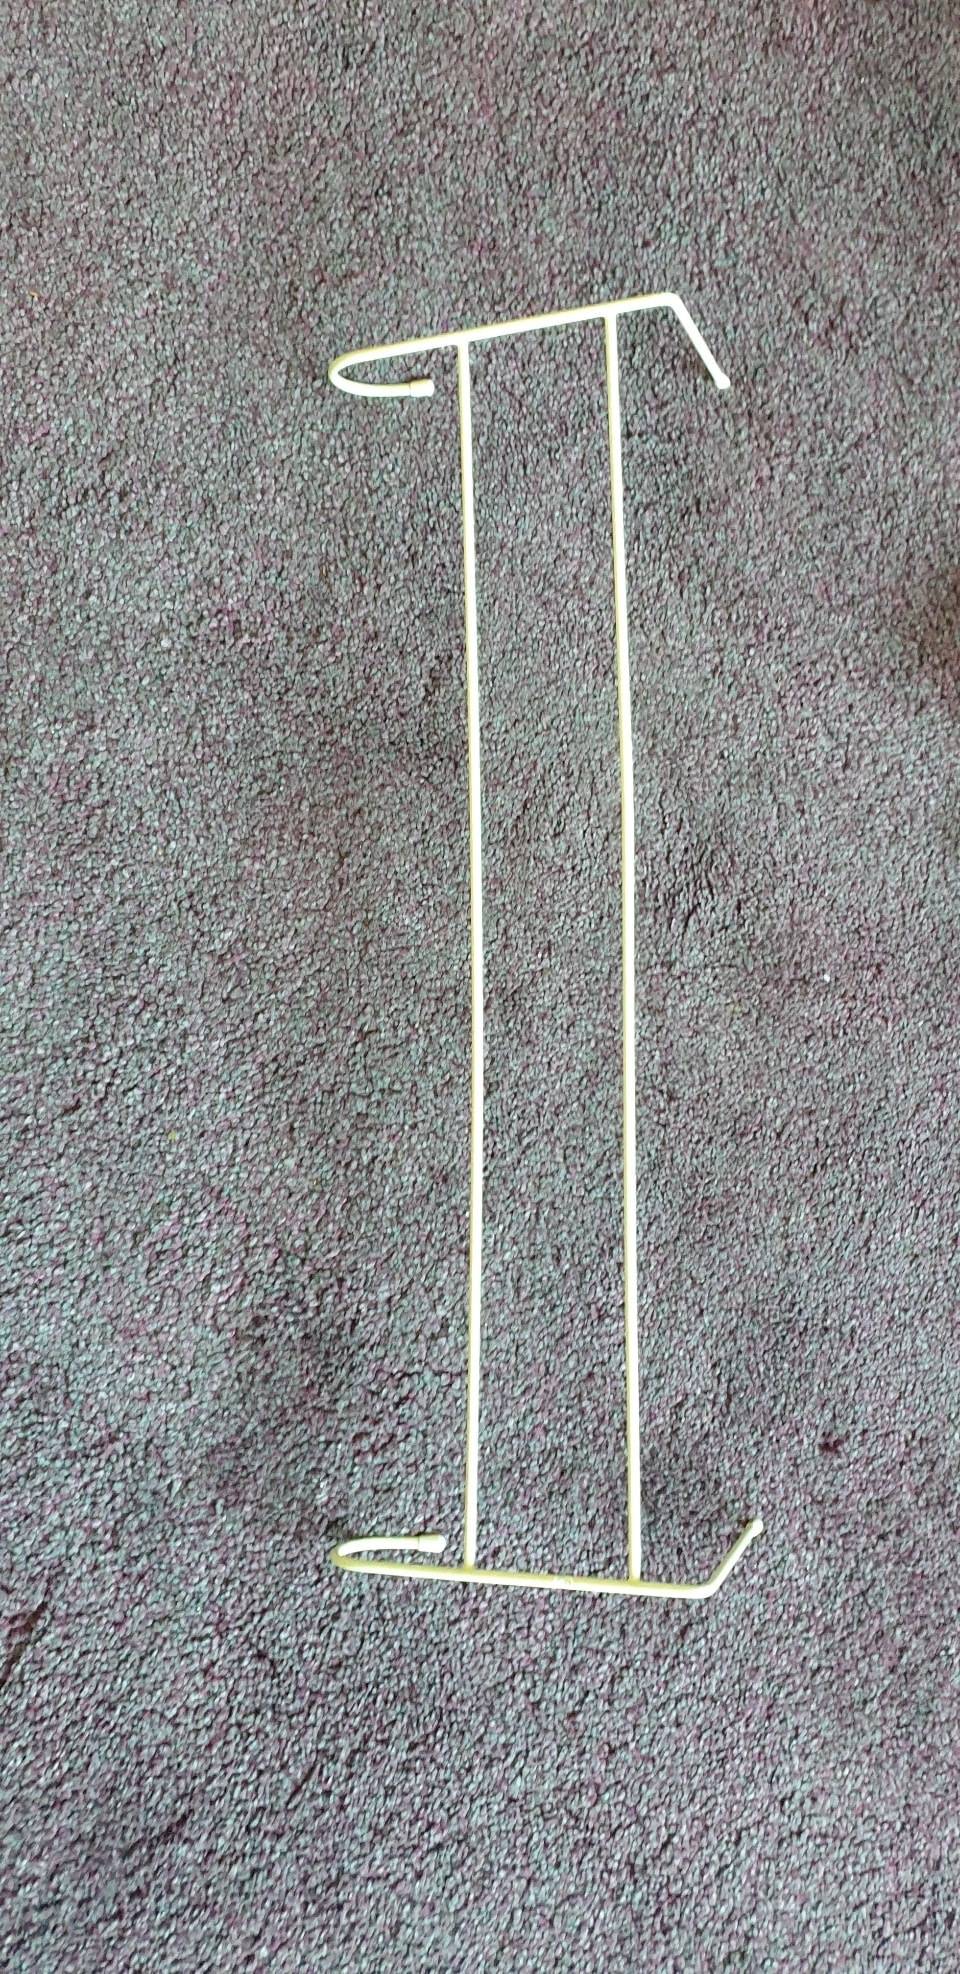 Drying rail